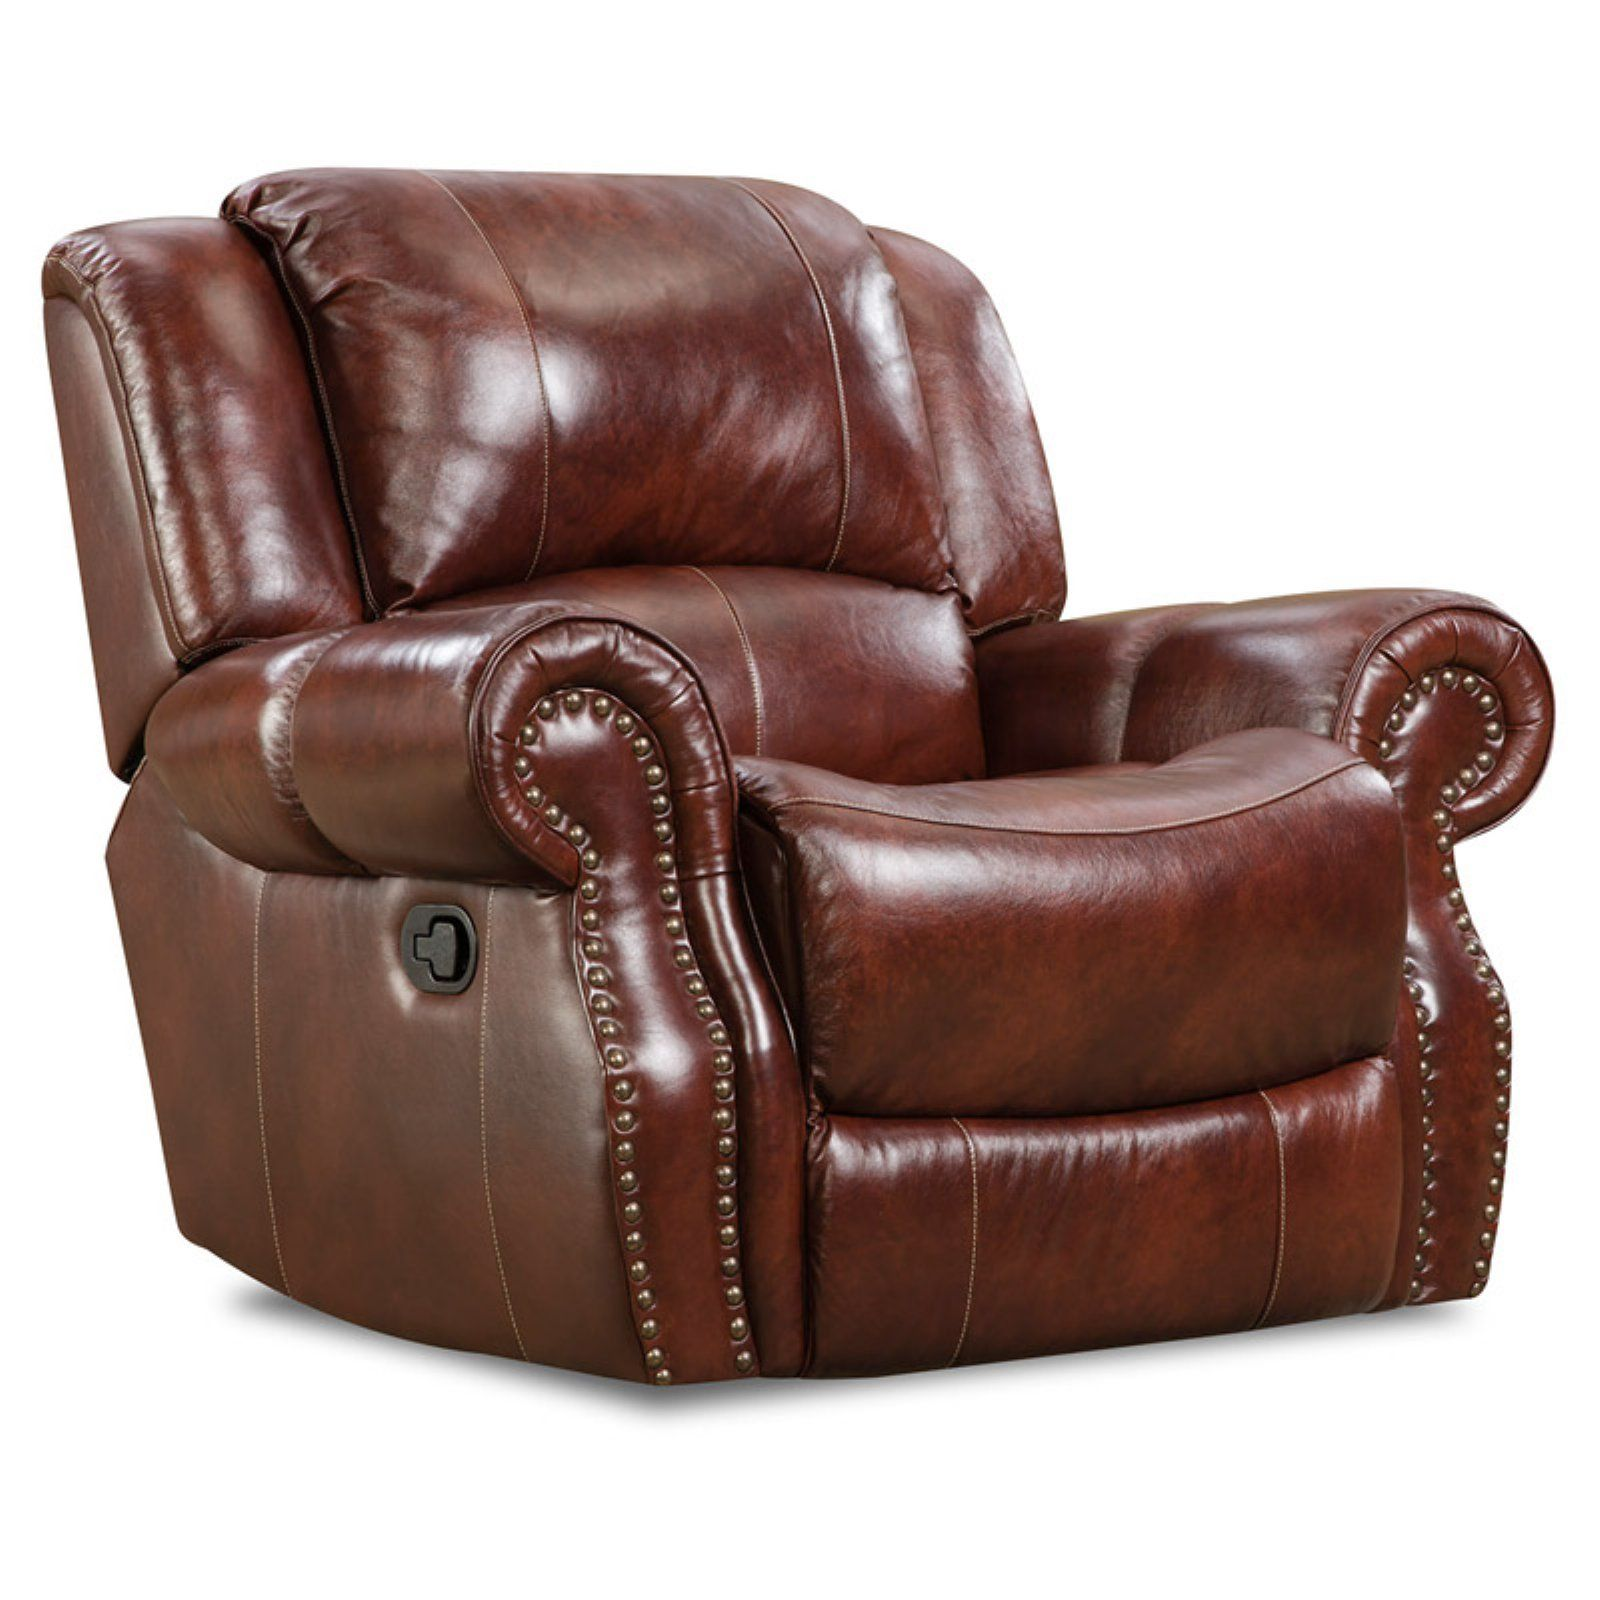 Cambridge Telluride Rocker Recliner Leather recliner